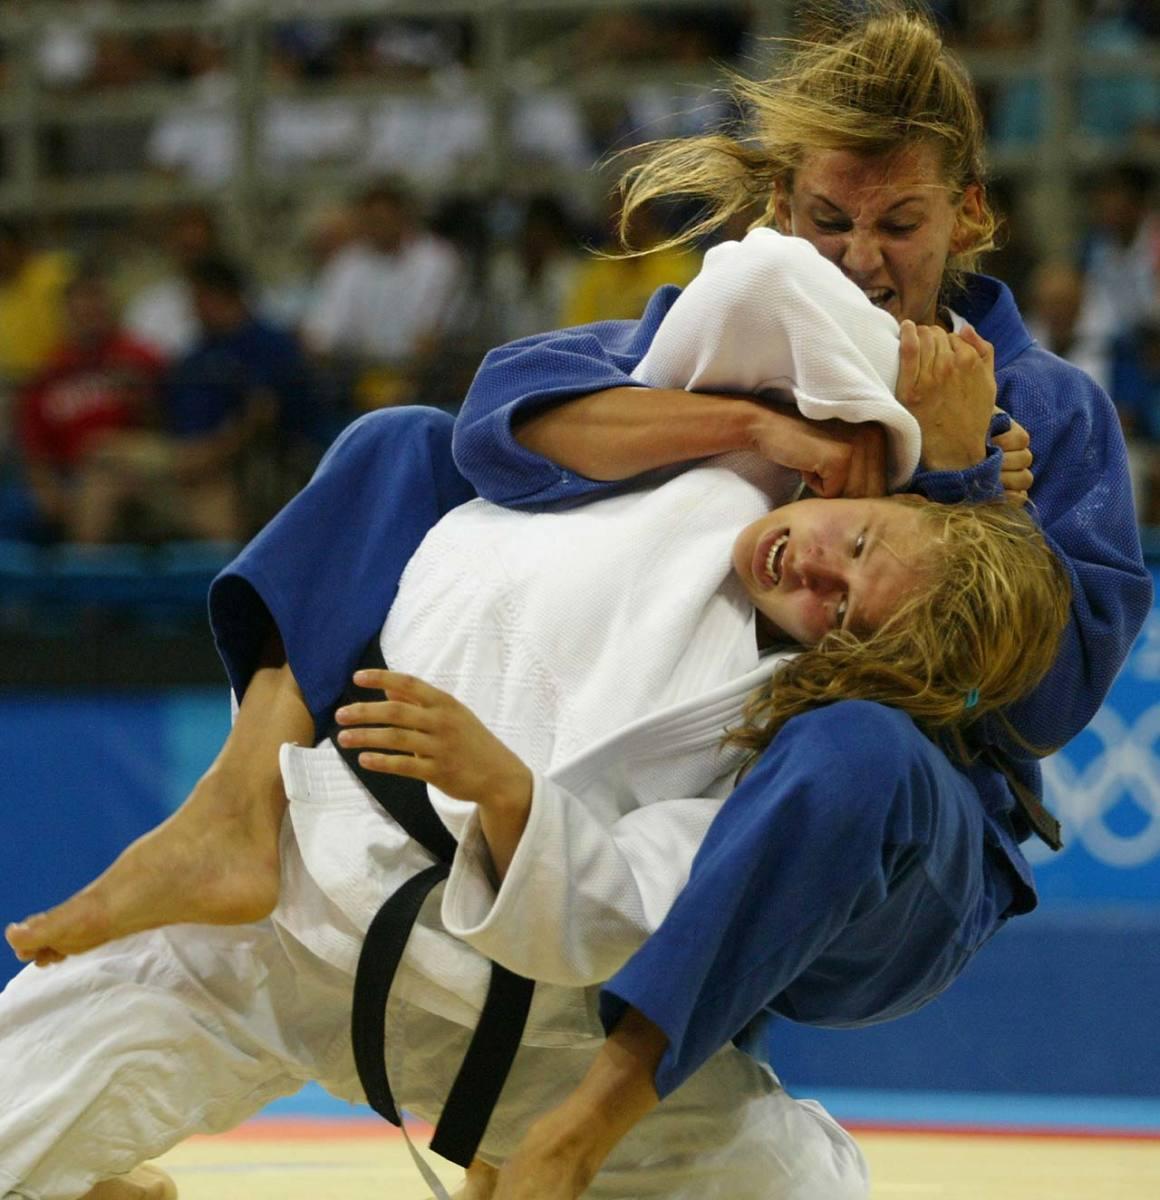 Ronda-Rousey-58.jpg